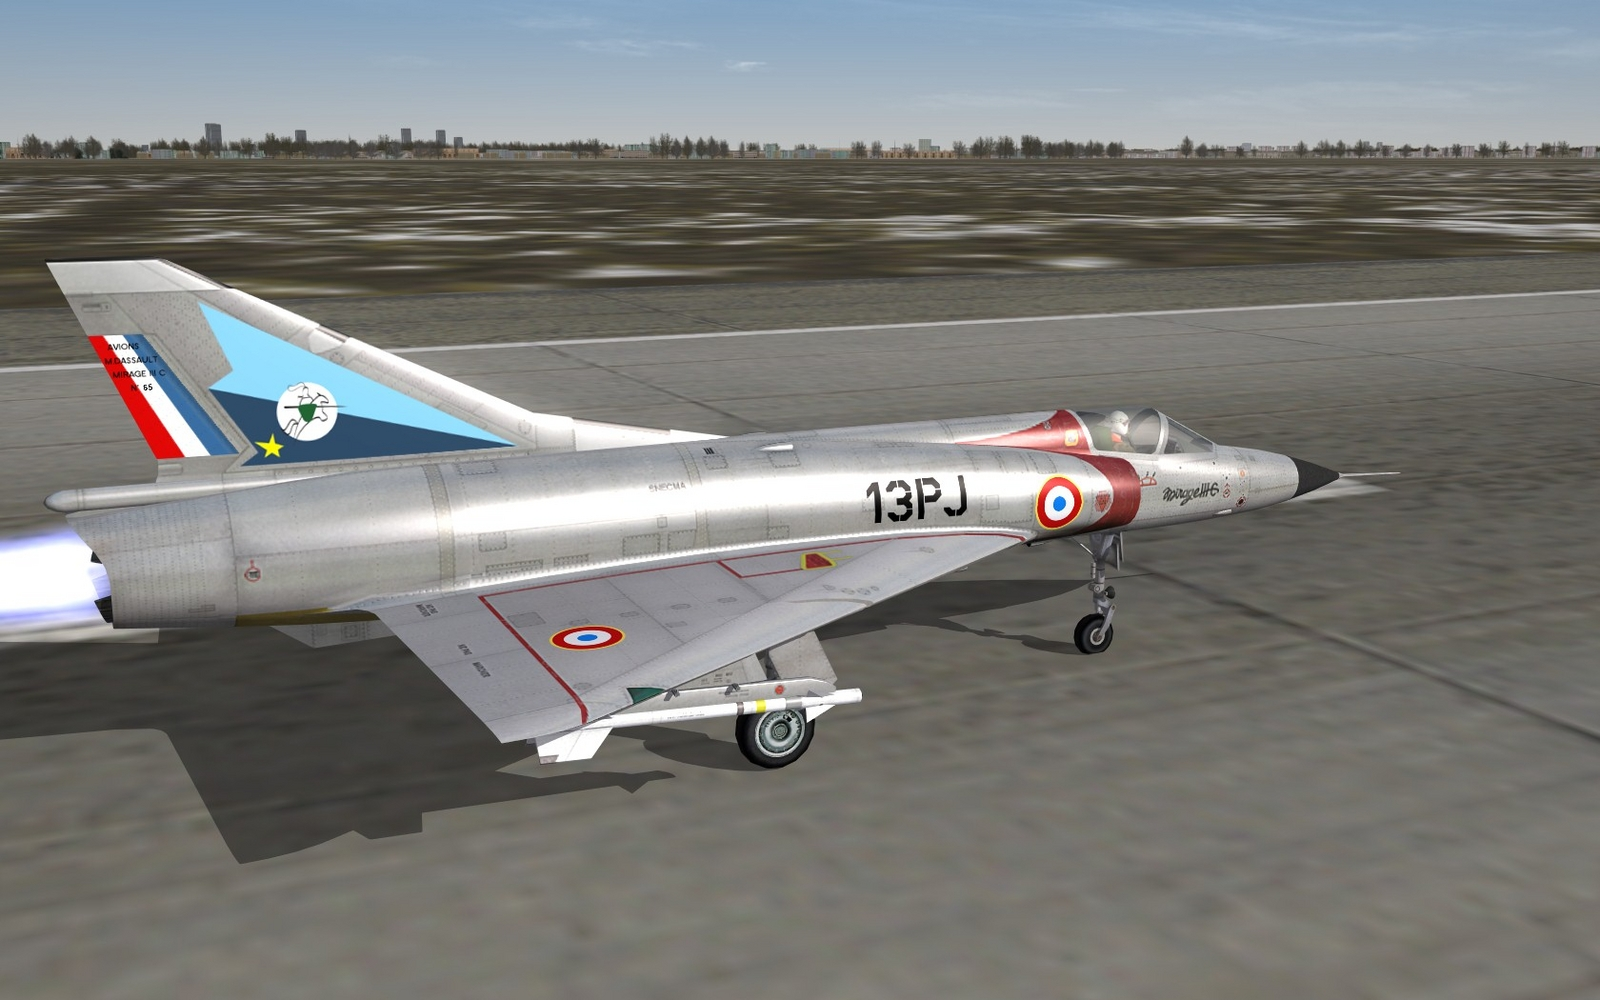 Mirage IIIC - EC 2/13 Alpes - ca. 1962